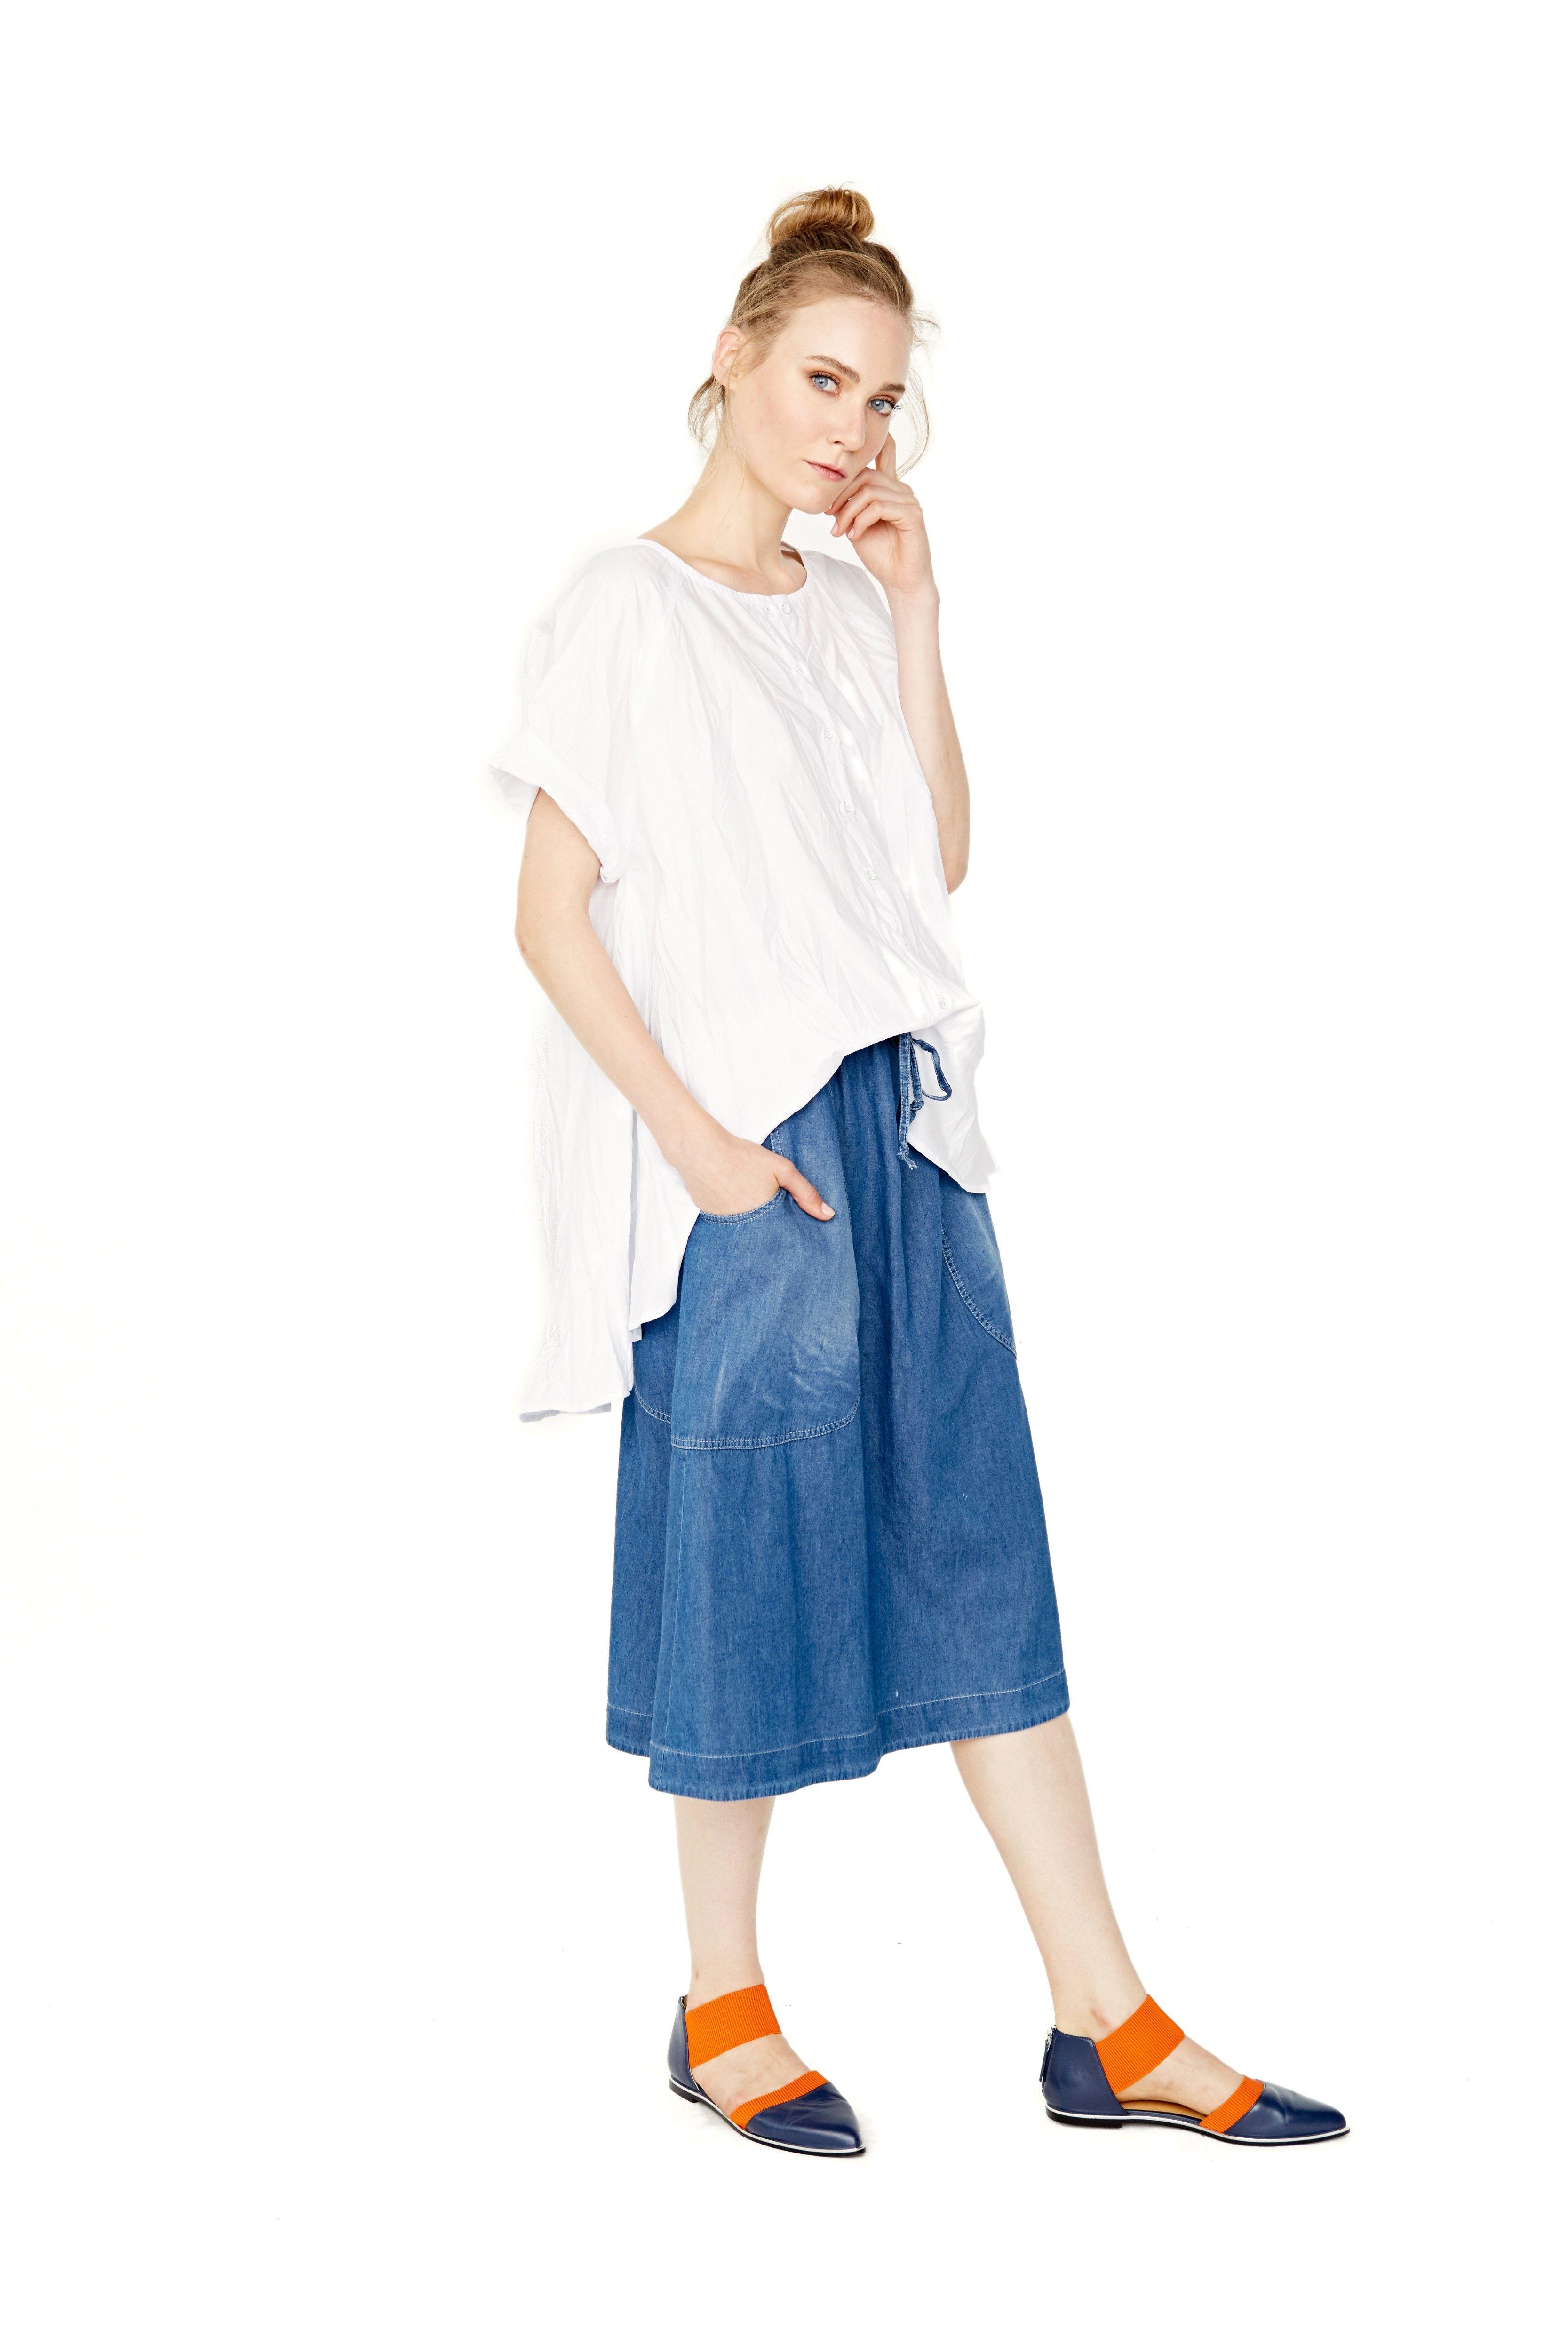 Alembika Spring/Summer 2017 White Hi Lo Shirt With Denim Skirt